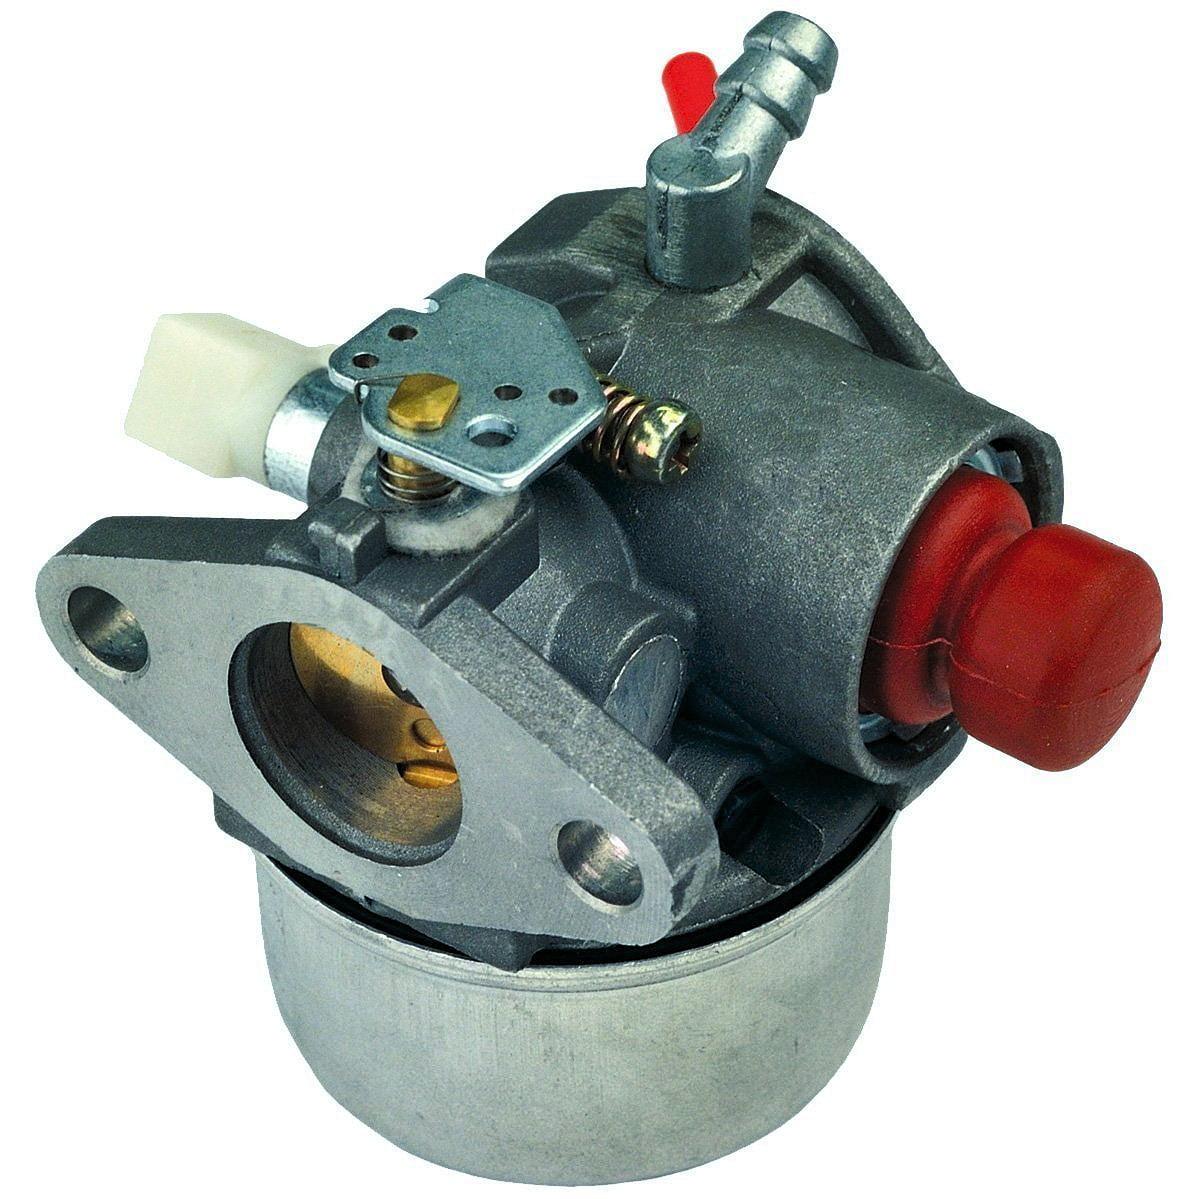 LEV105 Details about  /Carburetor 640350 640271 for Tecumseh Lawn-Boy Mower LEV100 640303